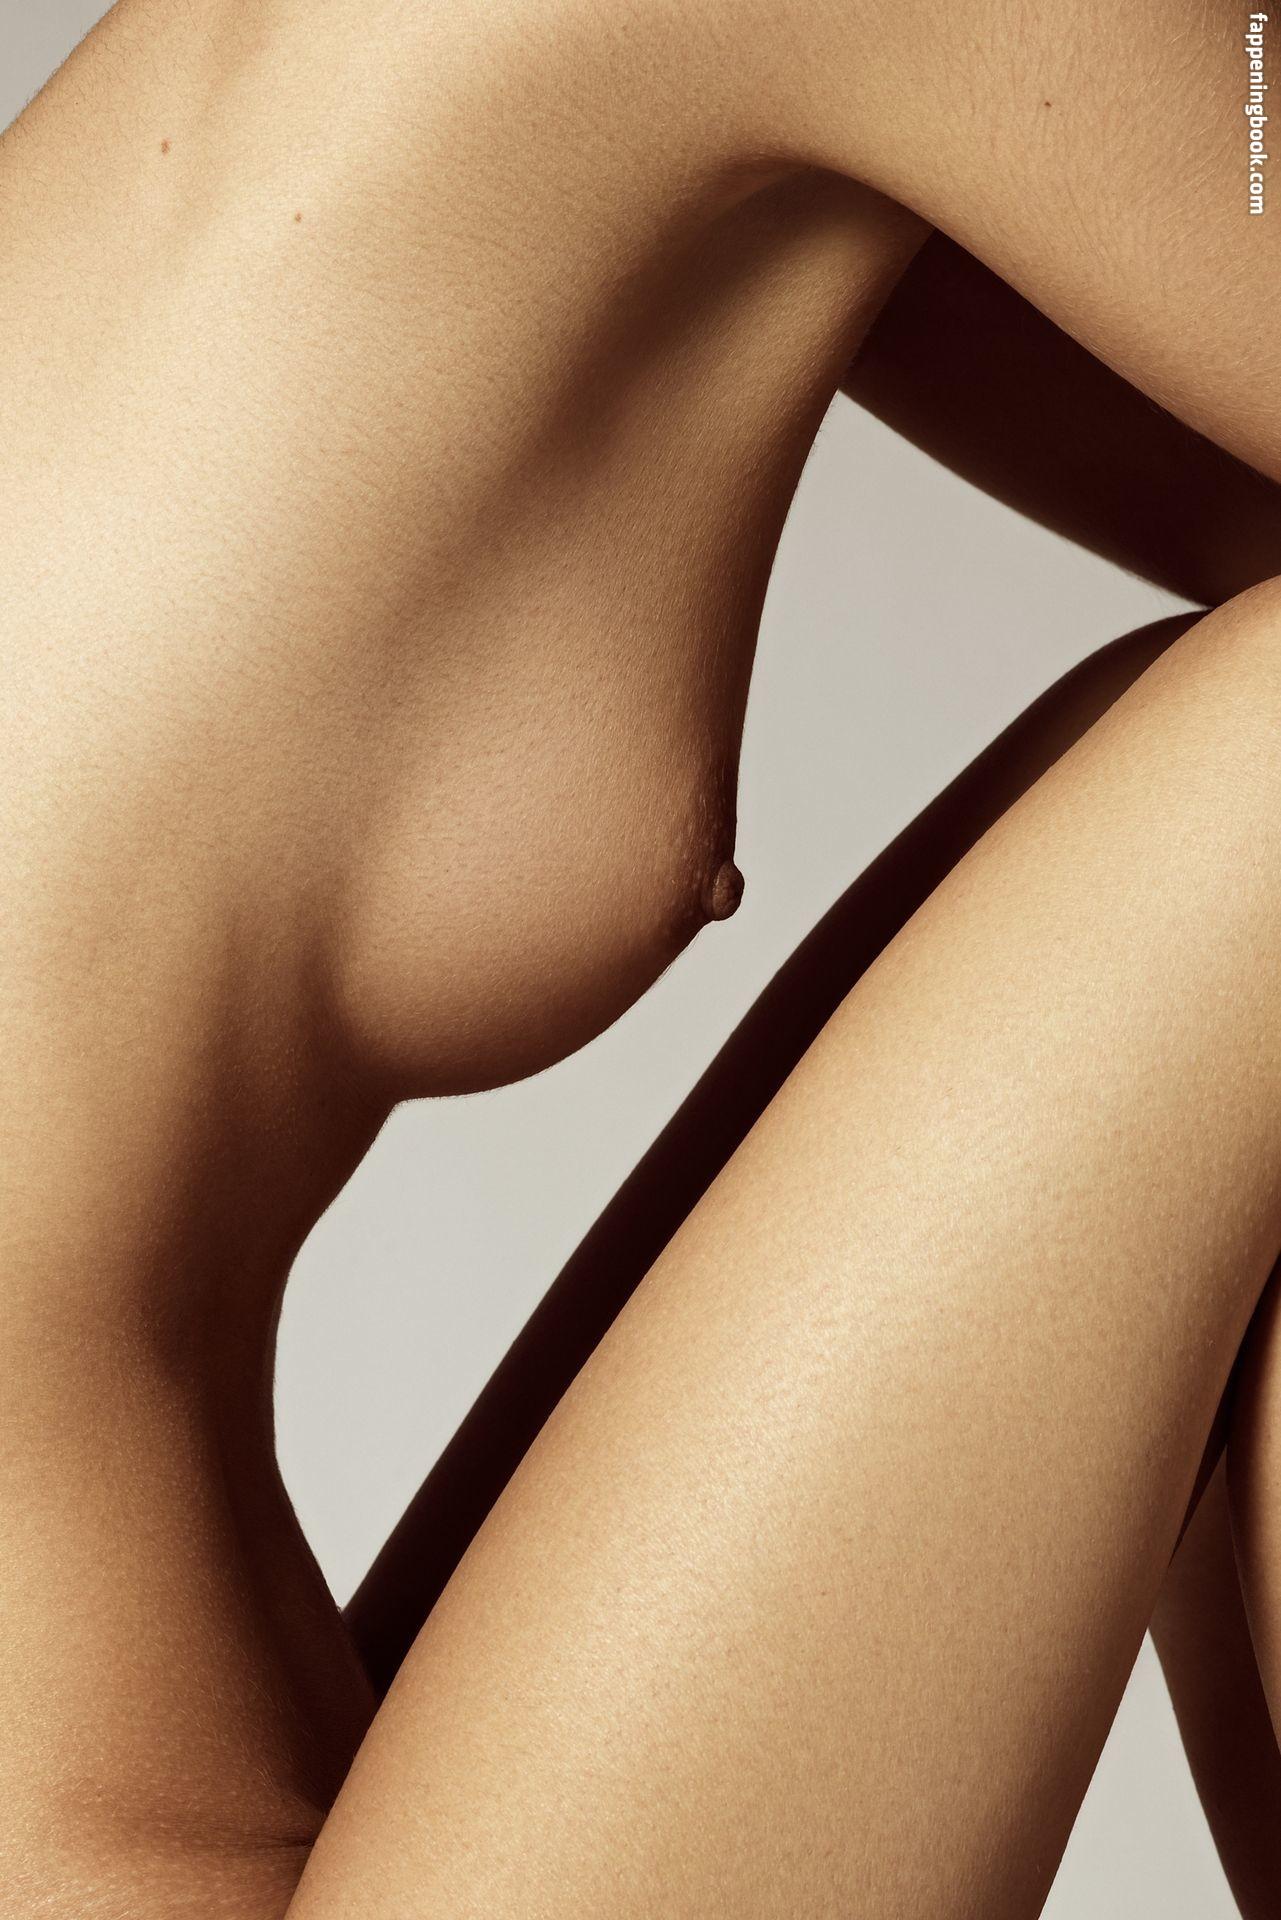 Shayna Lee nackt Lefur Totally Nude